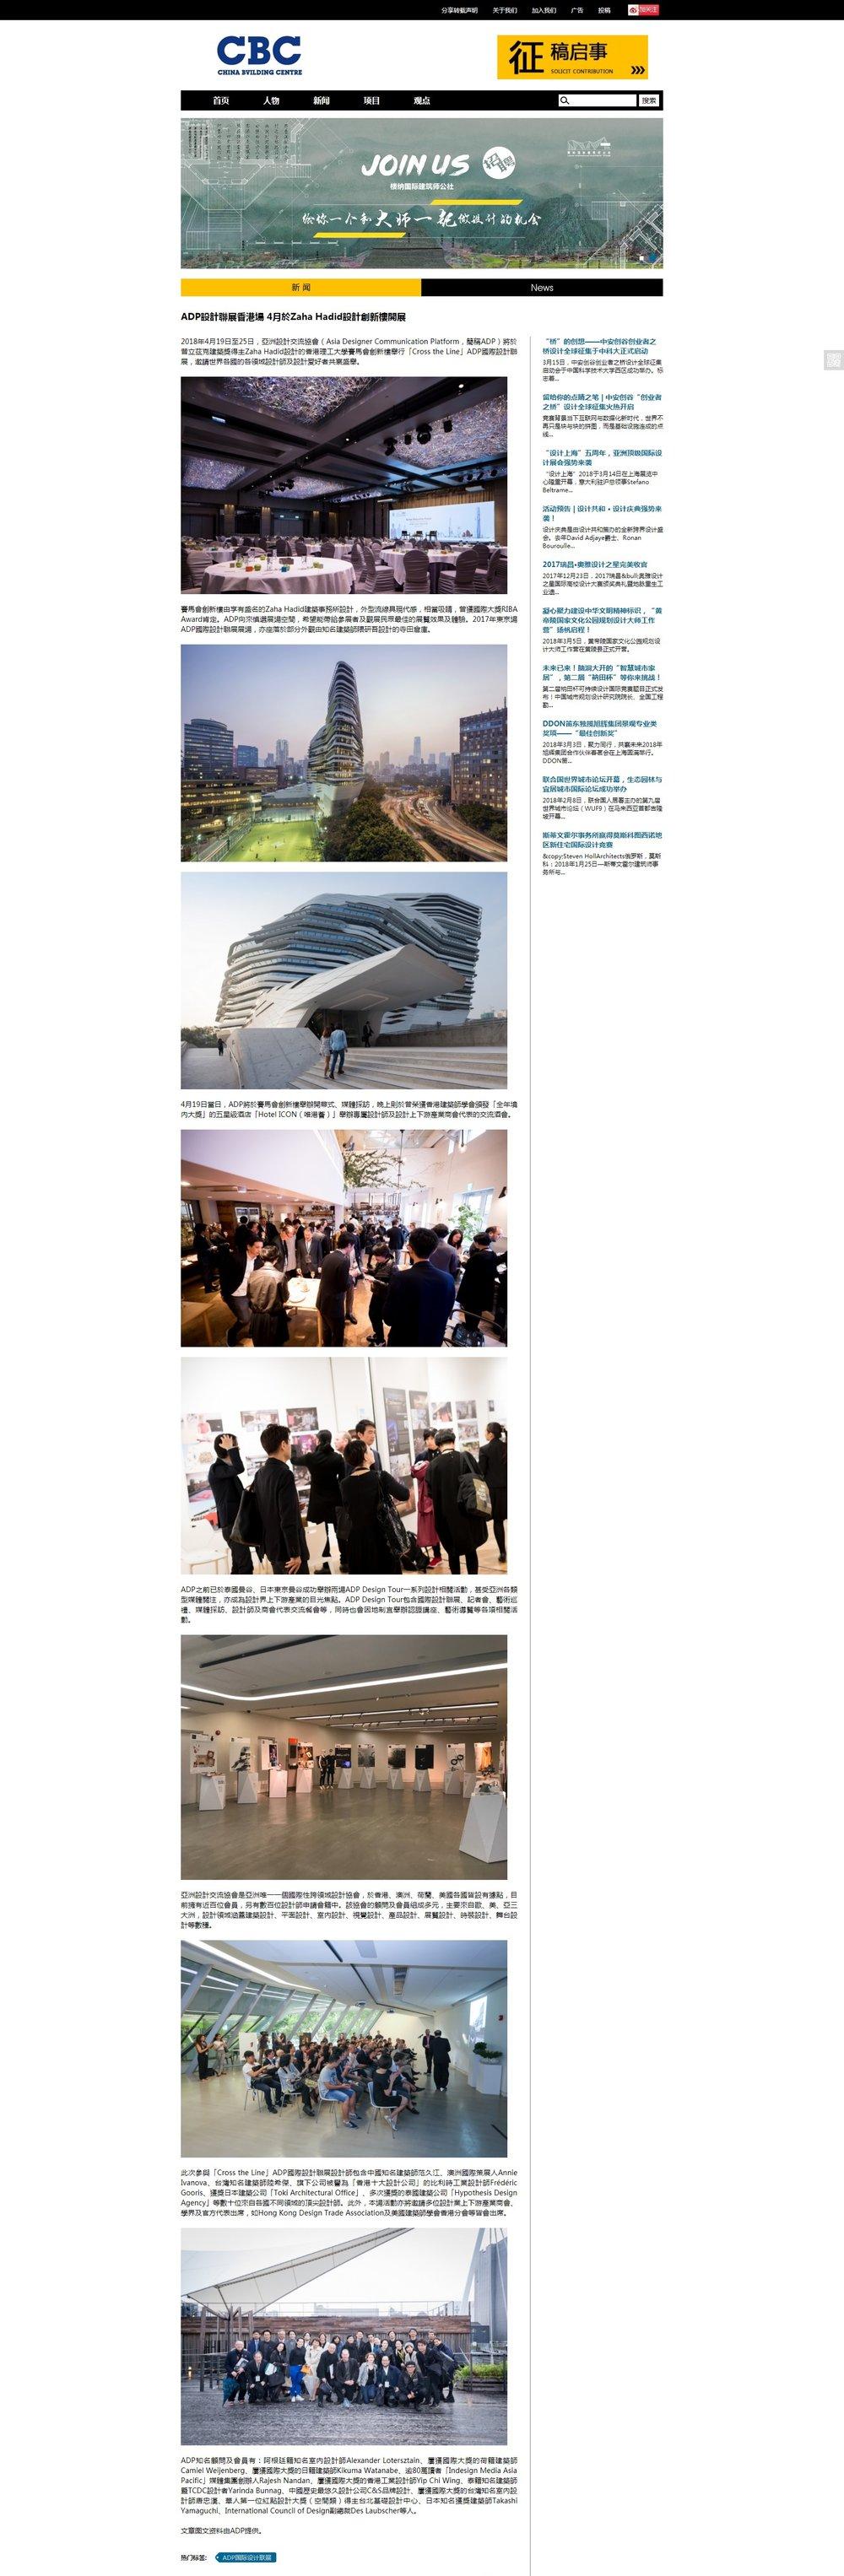 3. China Building Centre.jpg